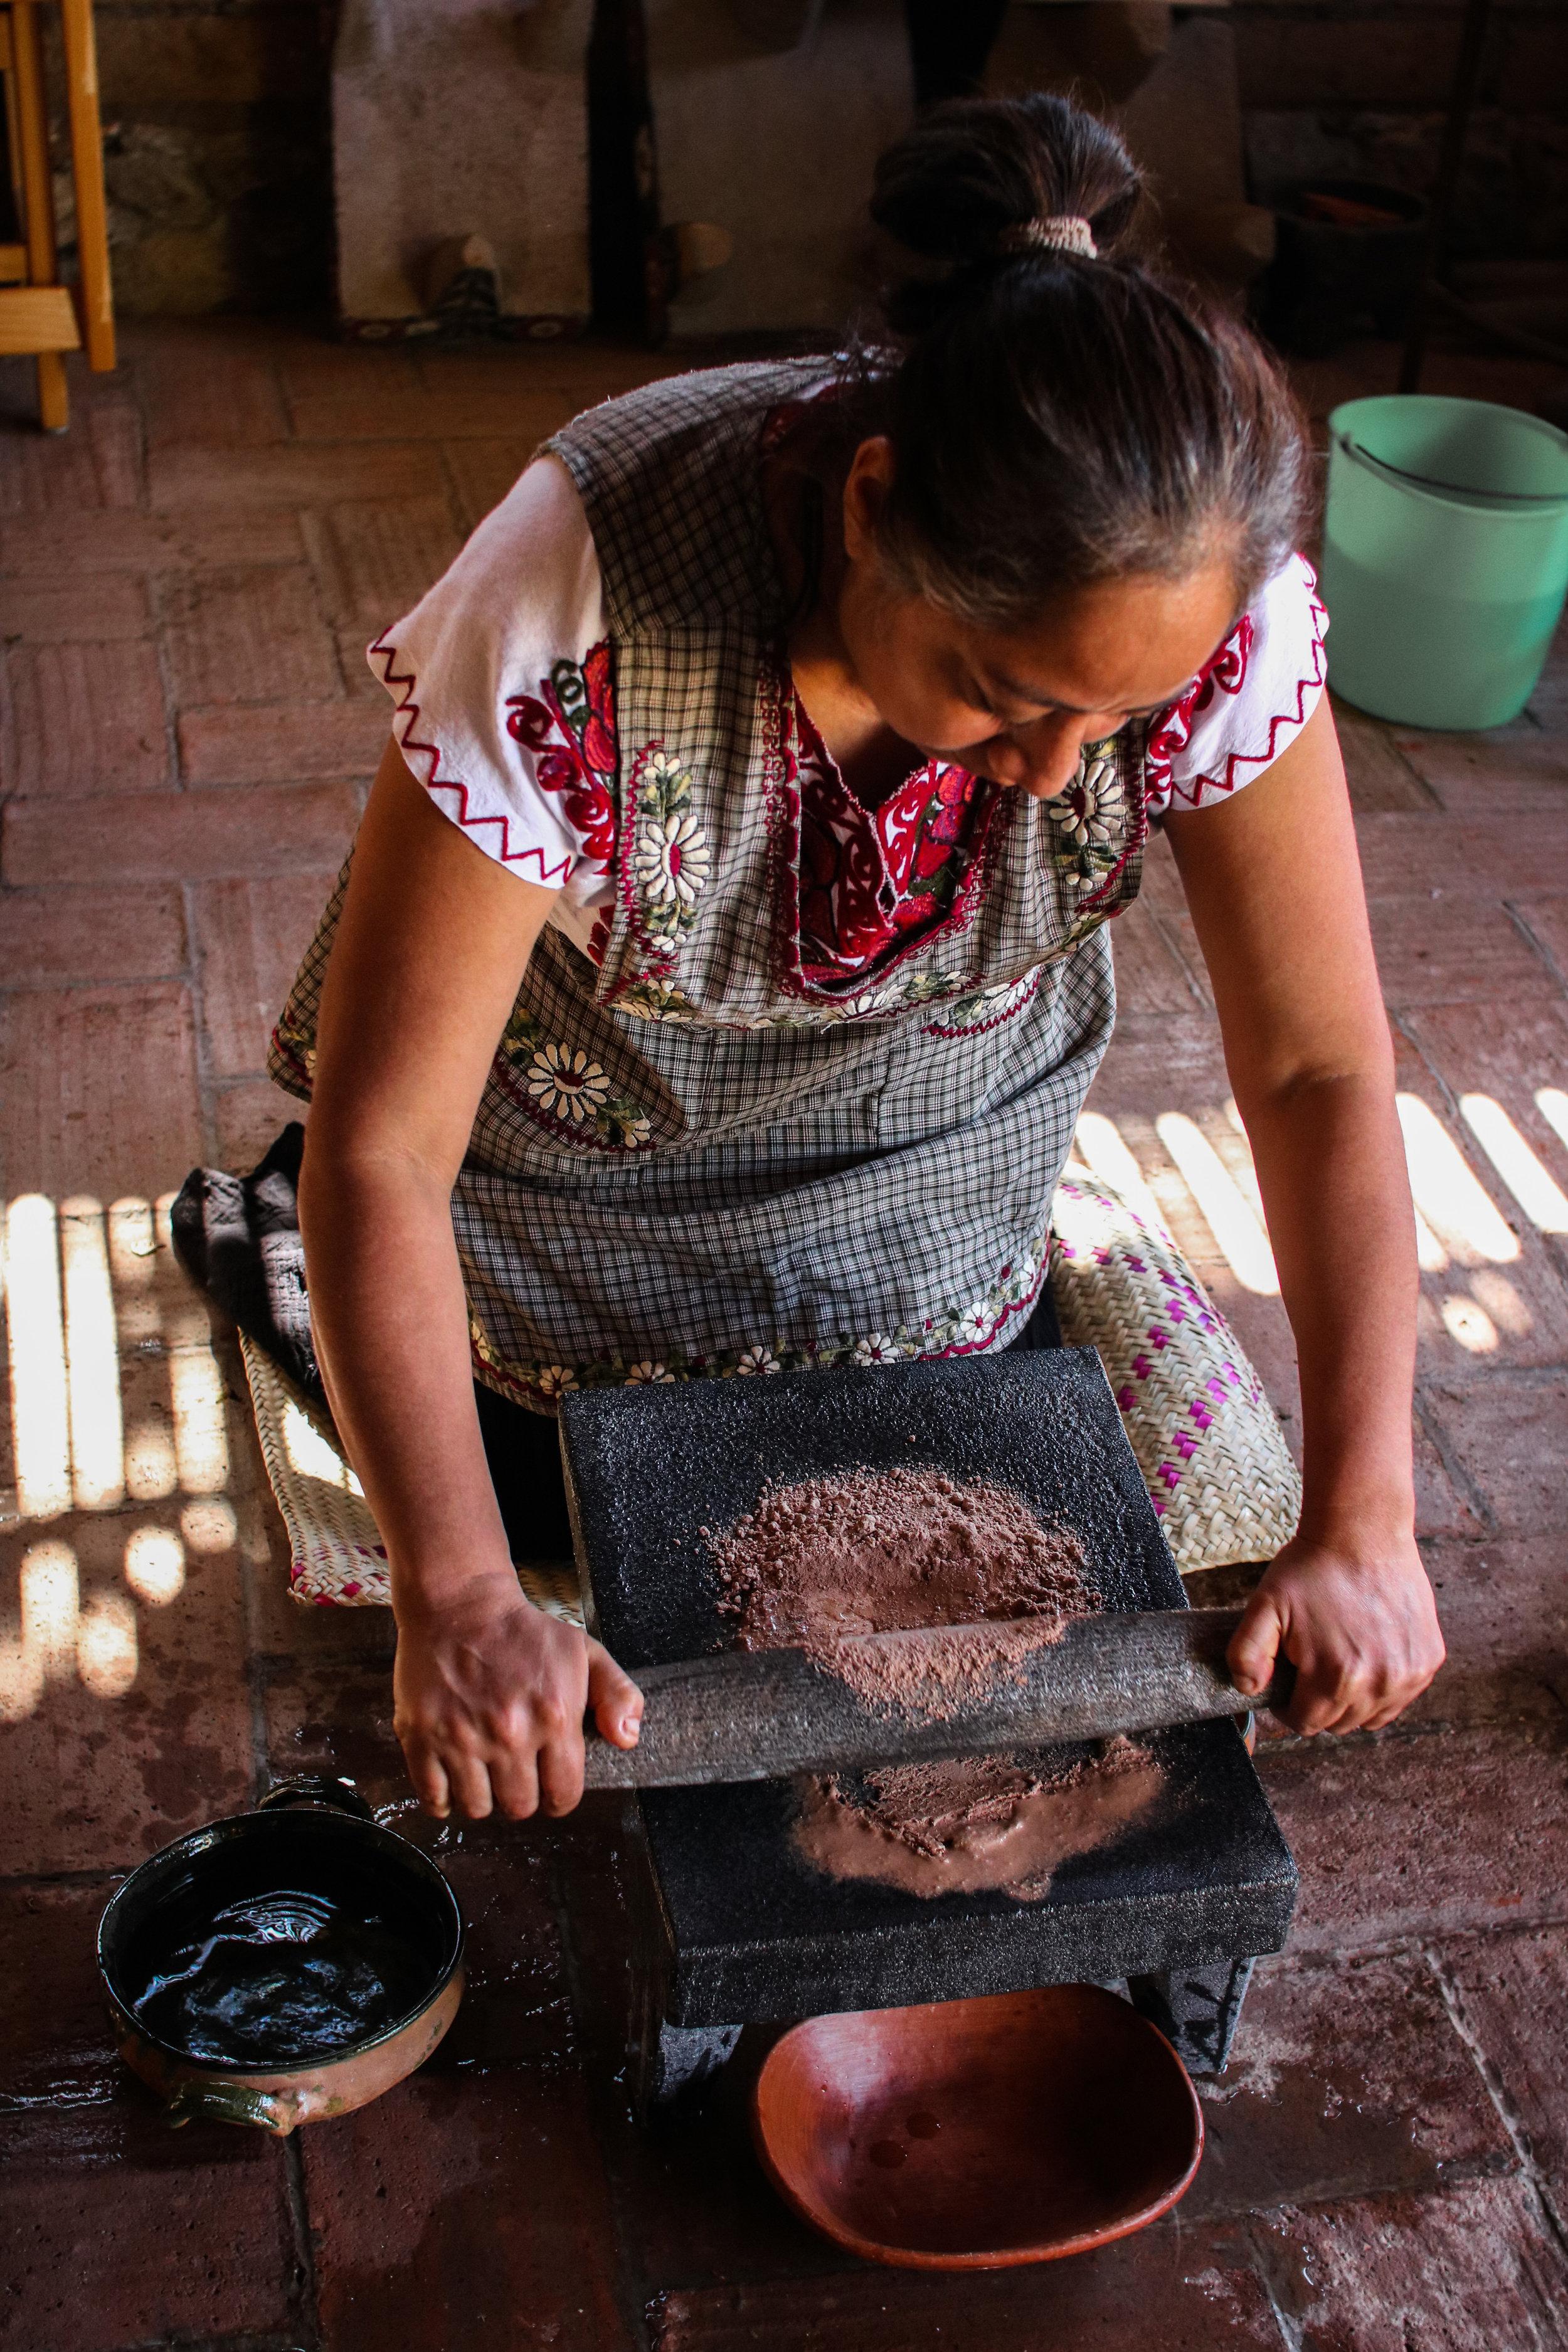 Carina Montano makingruby craig - green cocoa pod close up -48.jpg